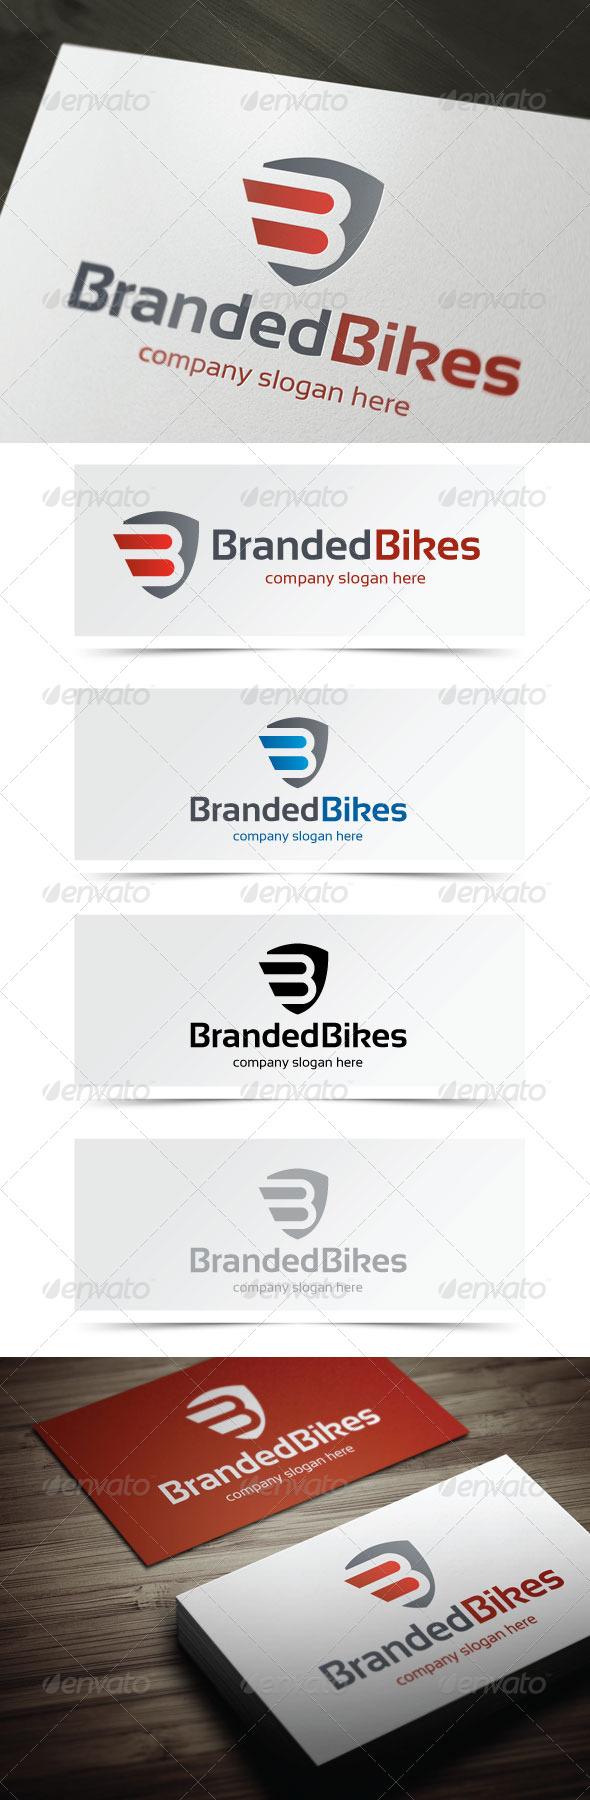 GraphicRiver Branded Bikes 5336243